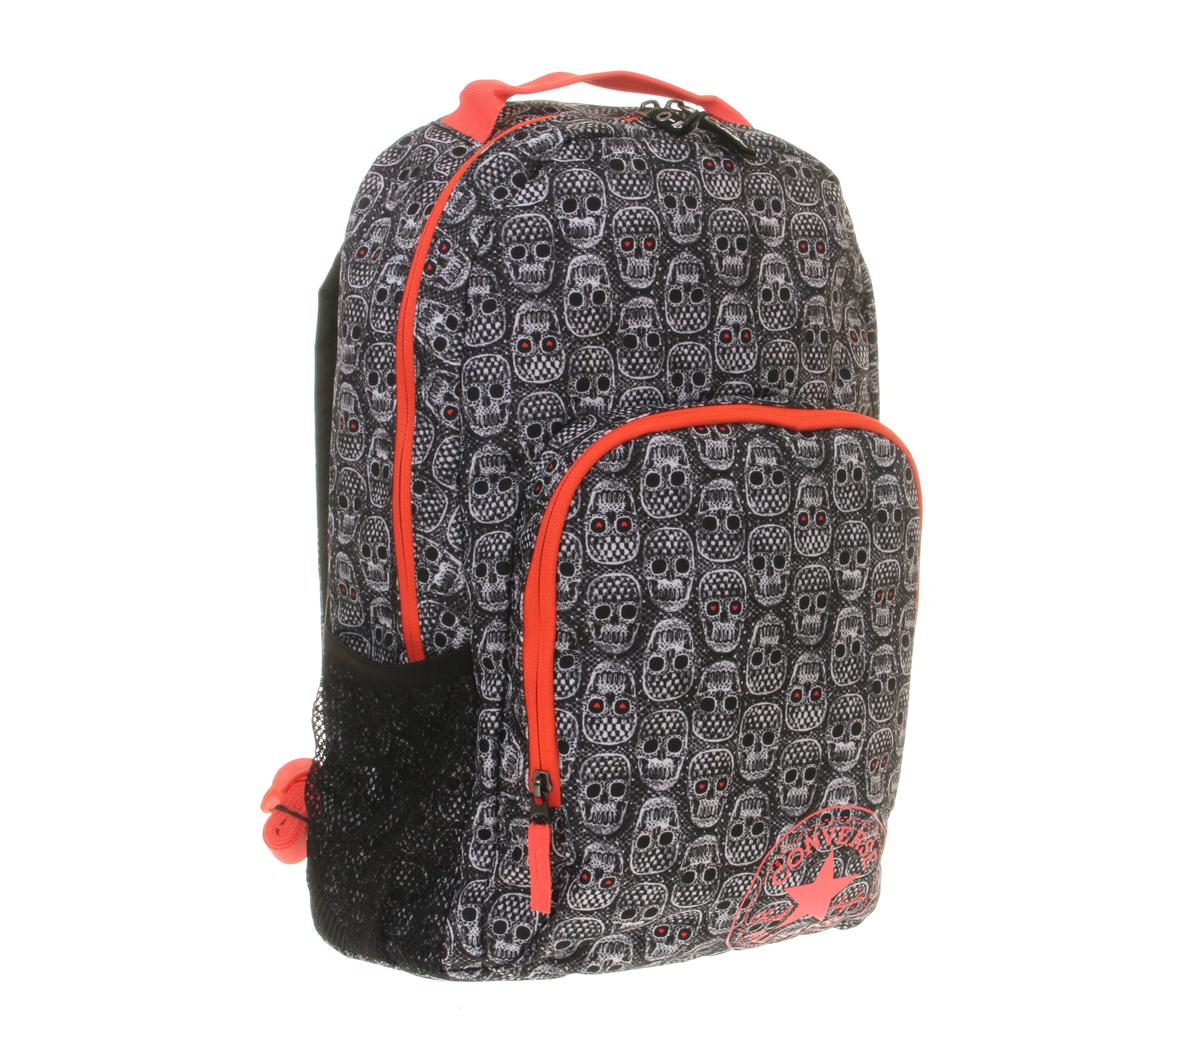 6c052fd3b1b Converse All In Back Pack in Orange for Men - Lyst